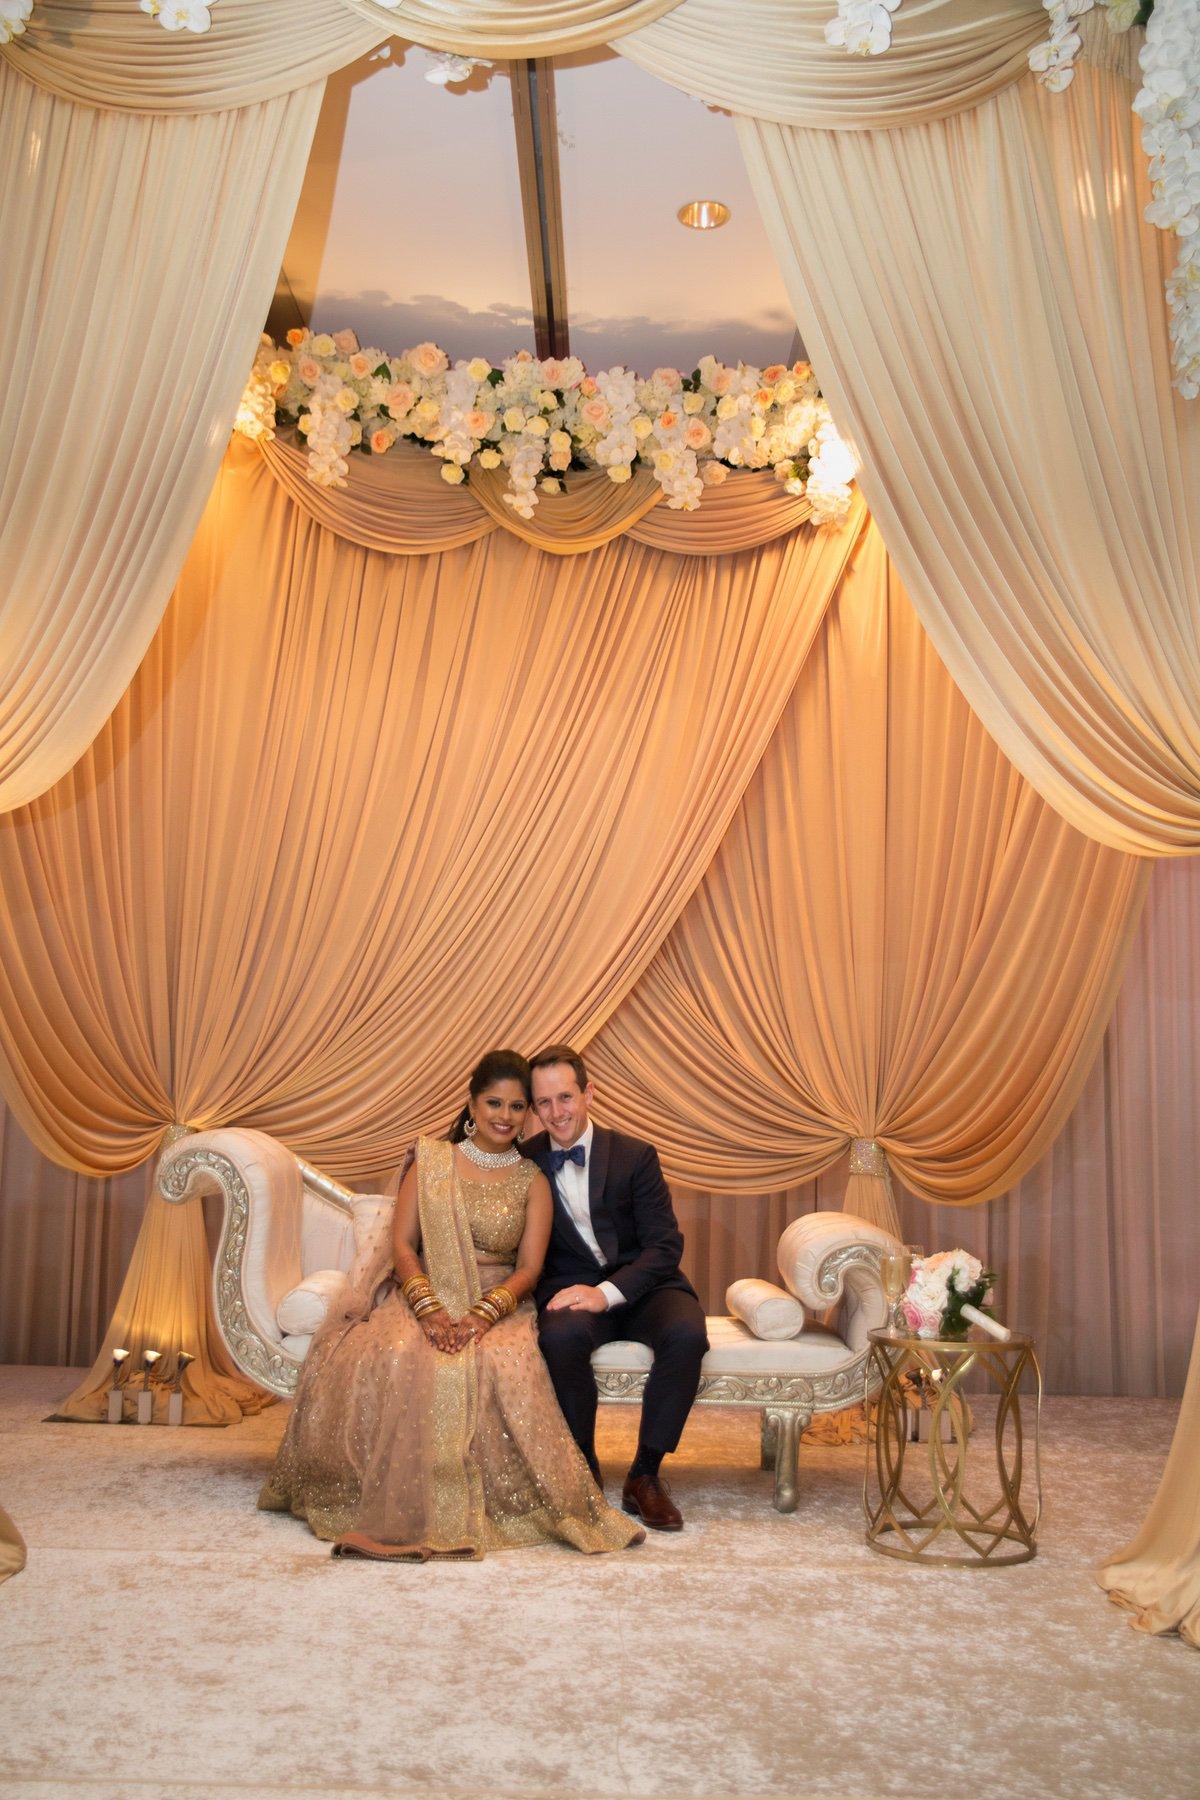 Le Cape Weddings - South Asian Wedding - Trisha and Jordan - Reception Details --42.jpg